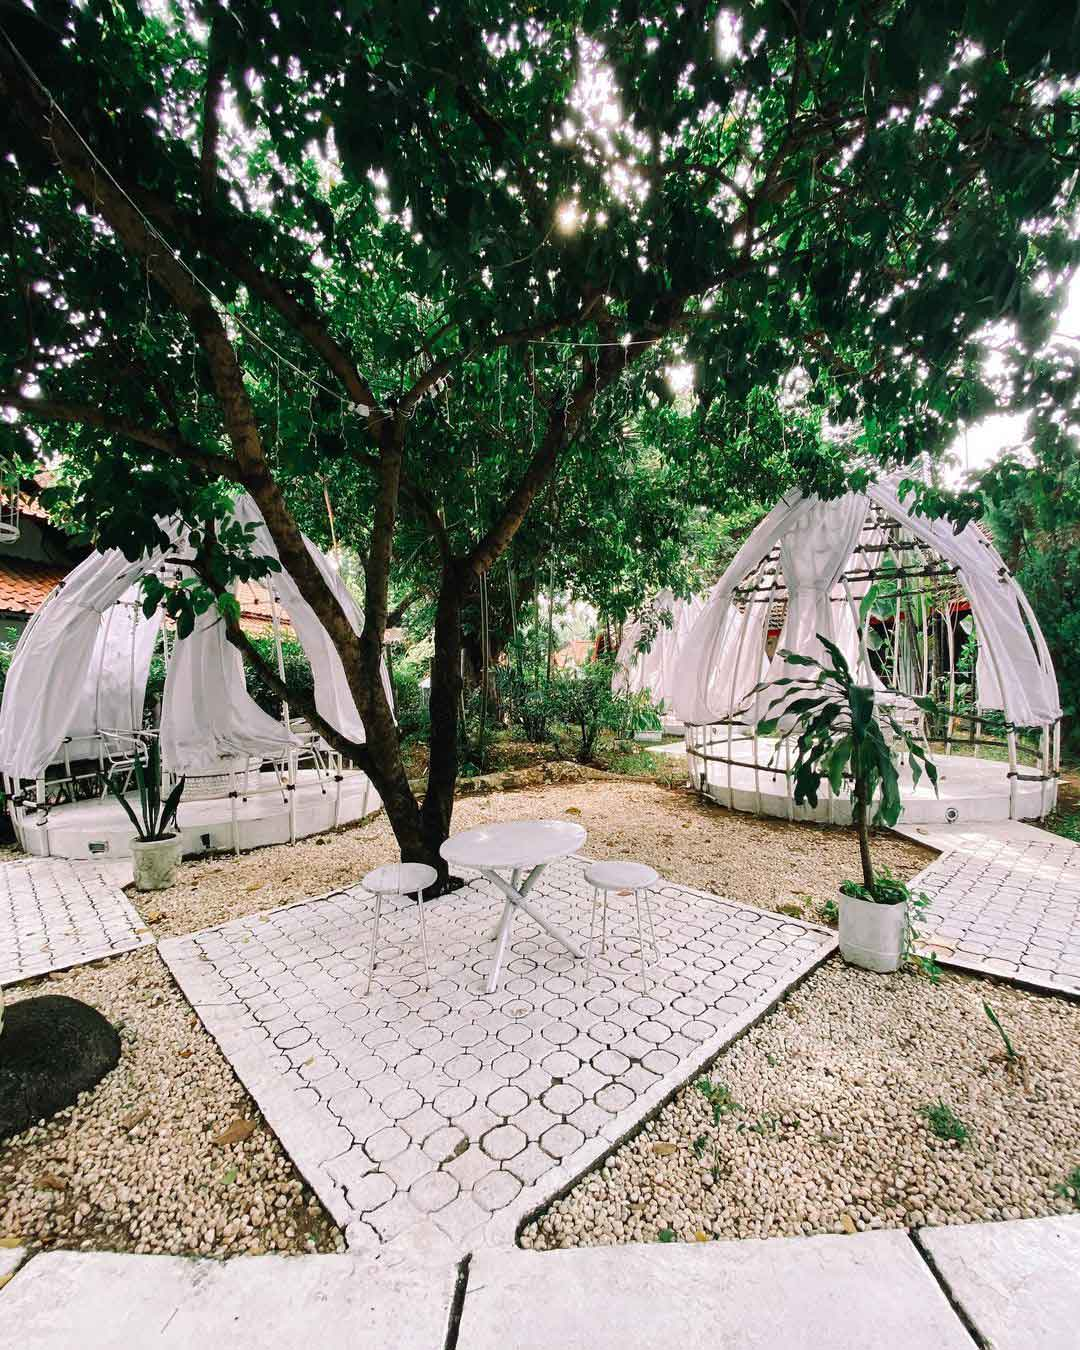 Suasana Cafe Kokonut Curtains Jakarta Bagian Outdoor Image From @oppakuliner